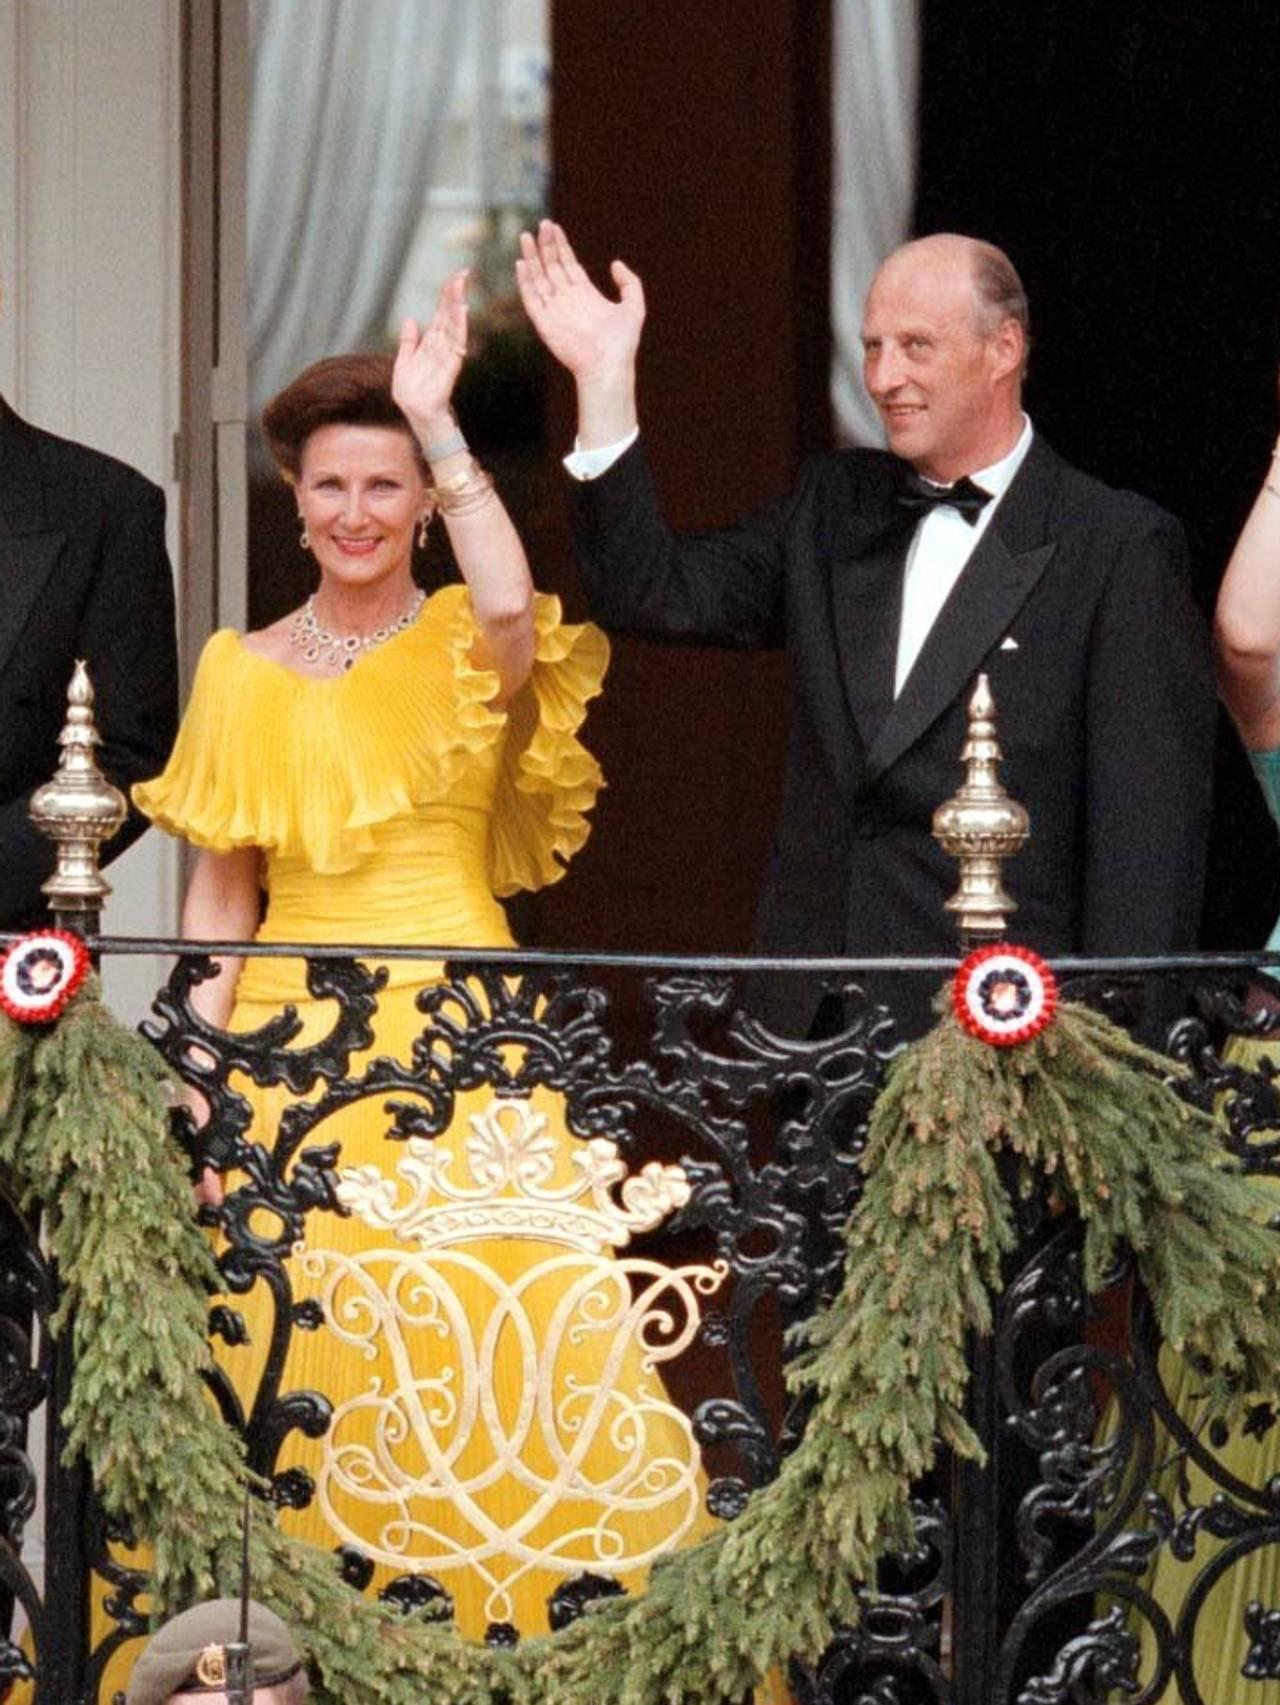 Dronning Sonja gul kjole